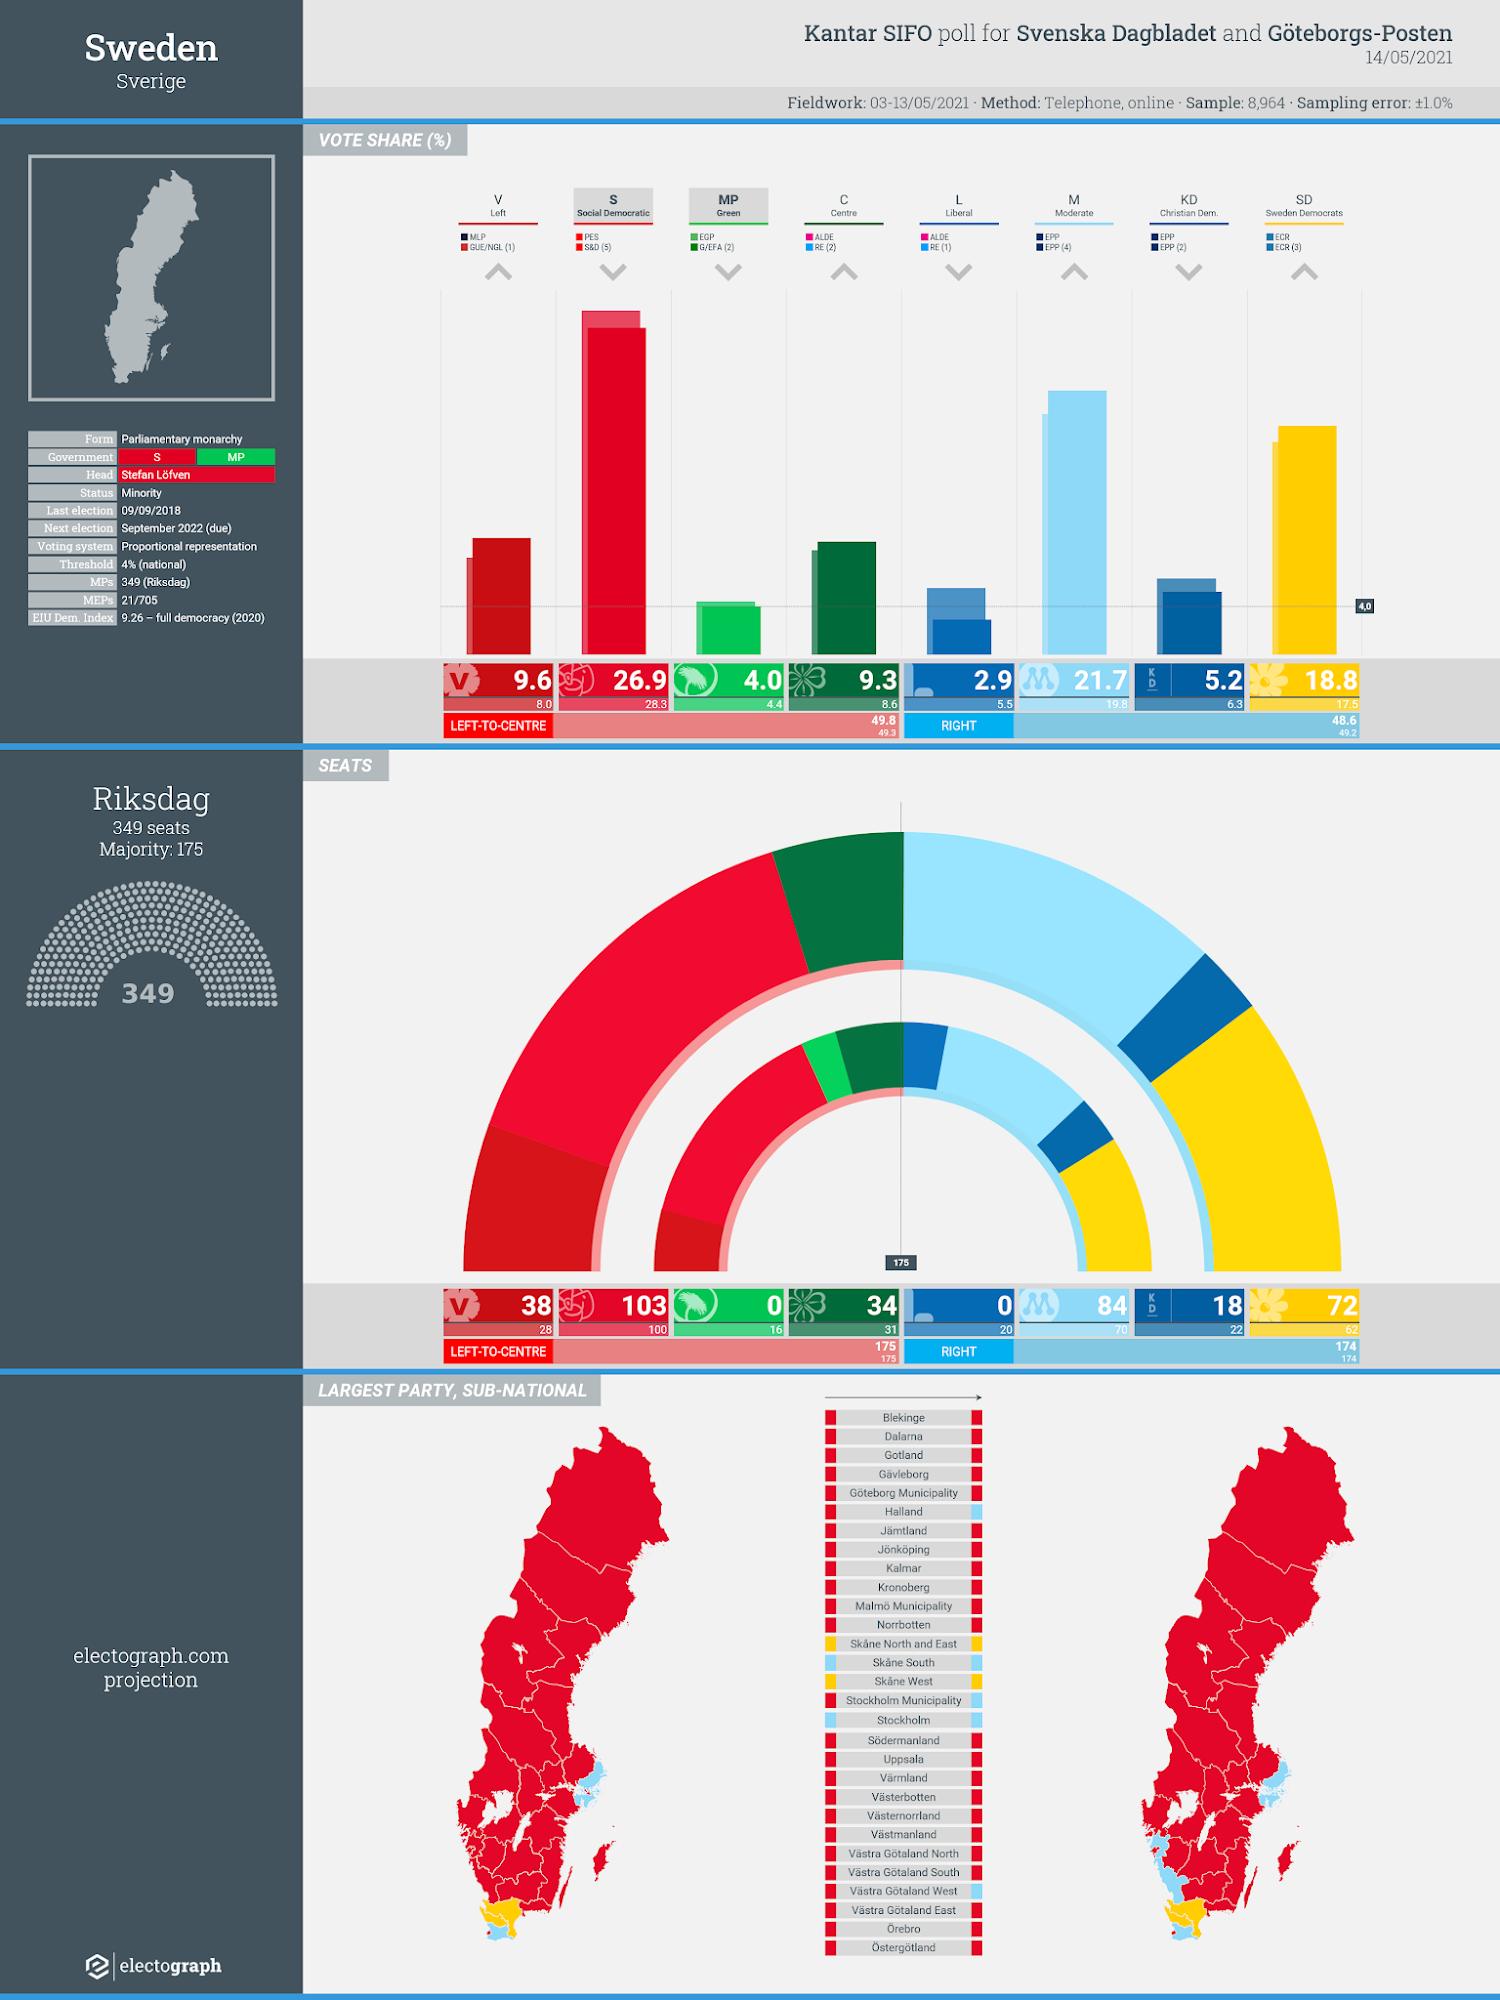 SWEDEN: Kantar SIFO poll chart for Svenska Dagbladet and Göteborgs-Posten, 14 May 2021